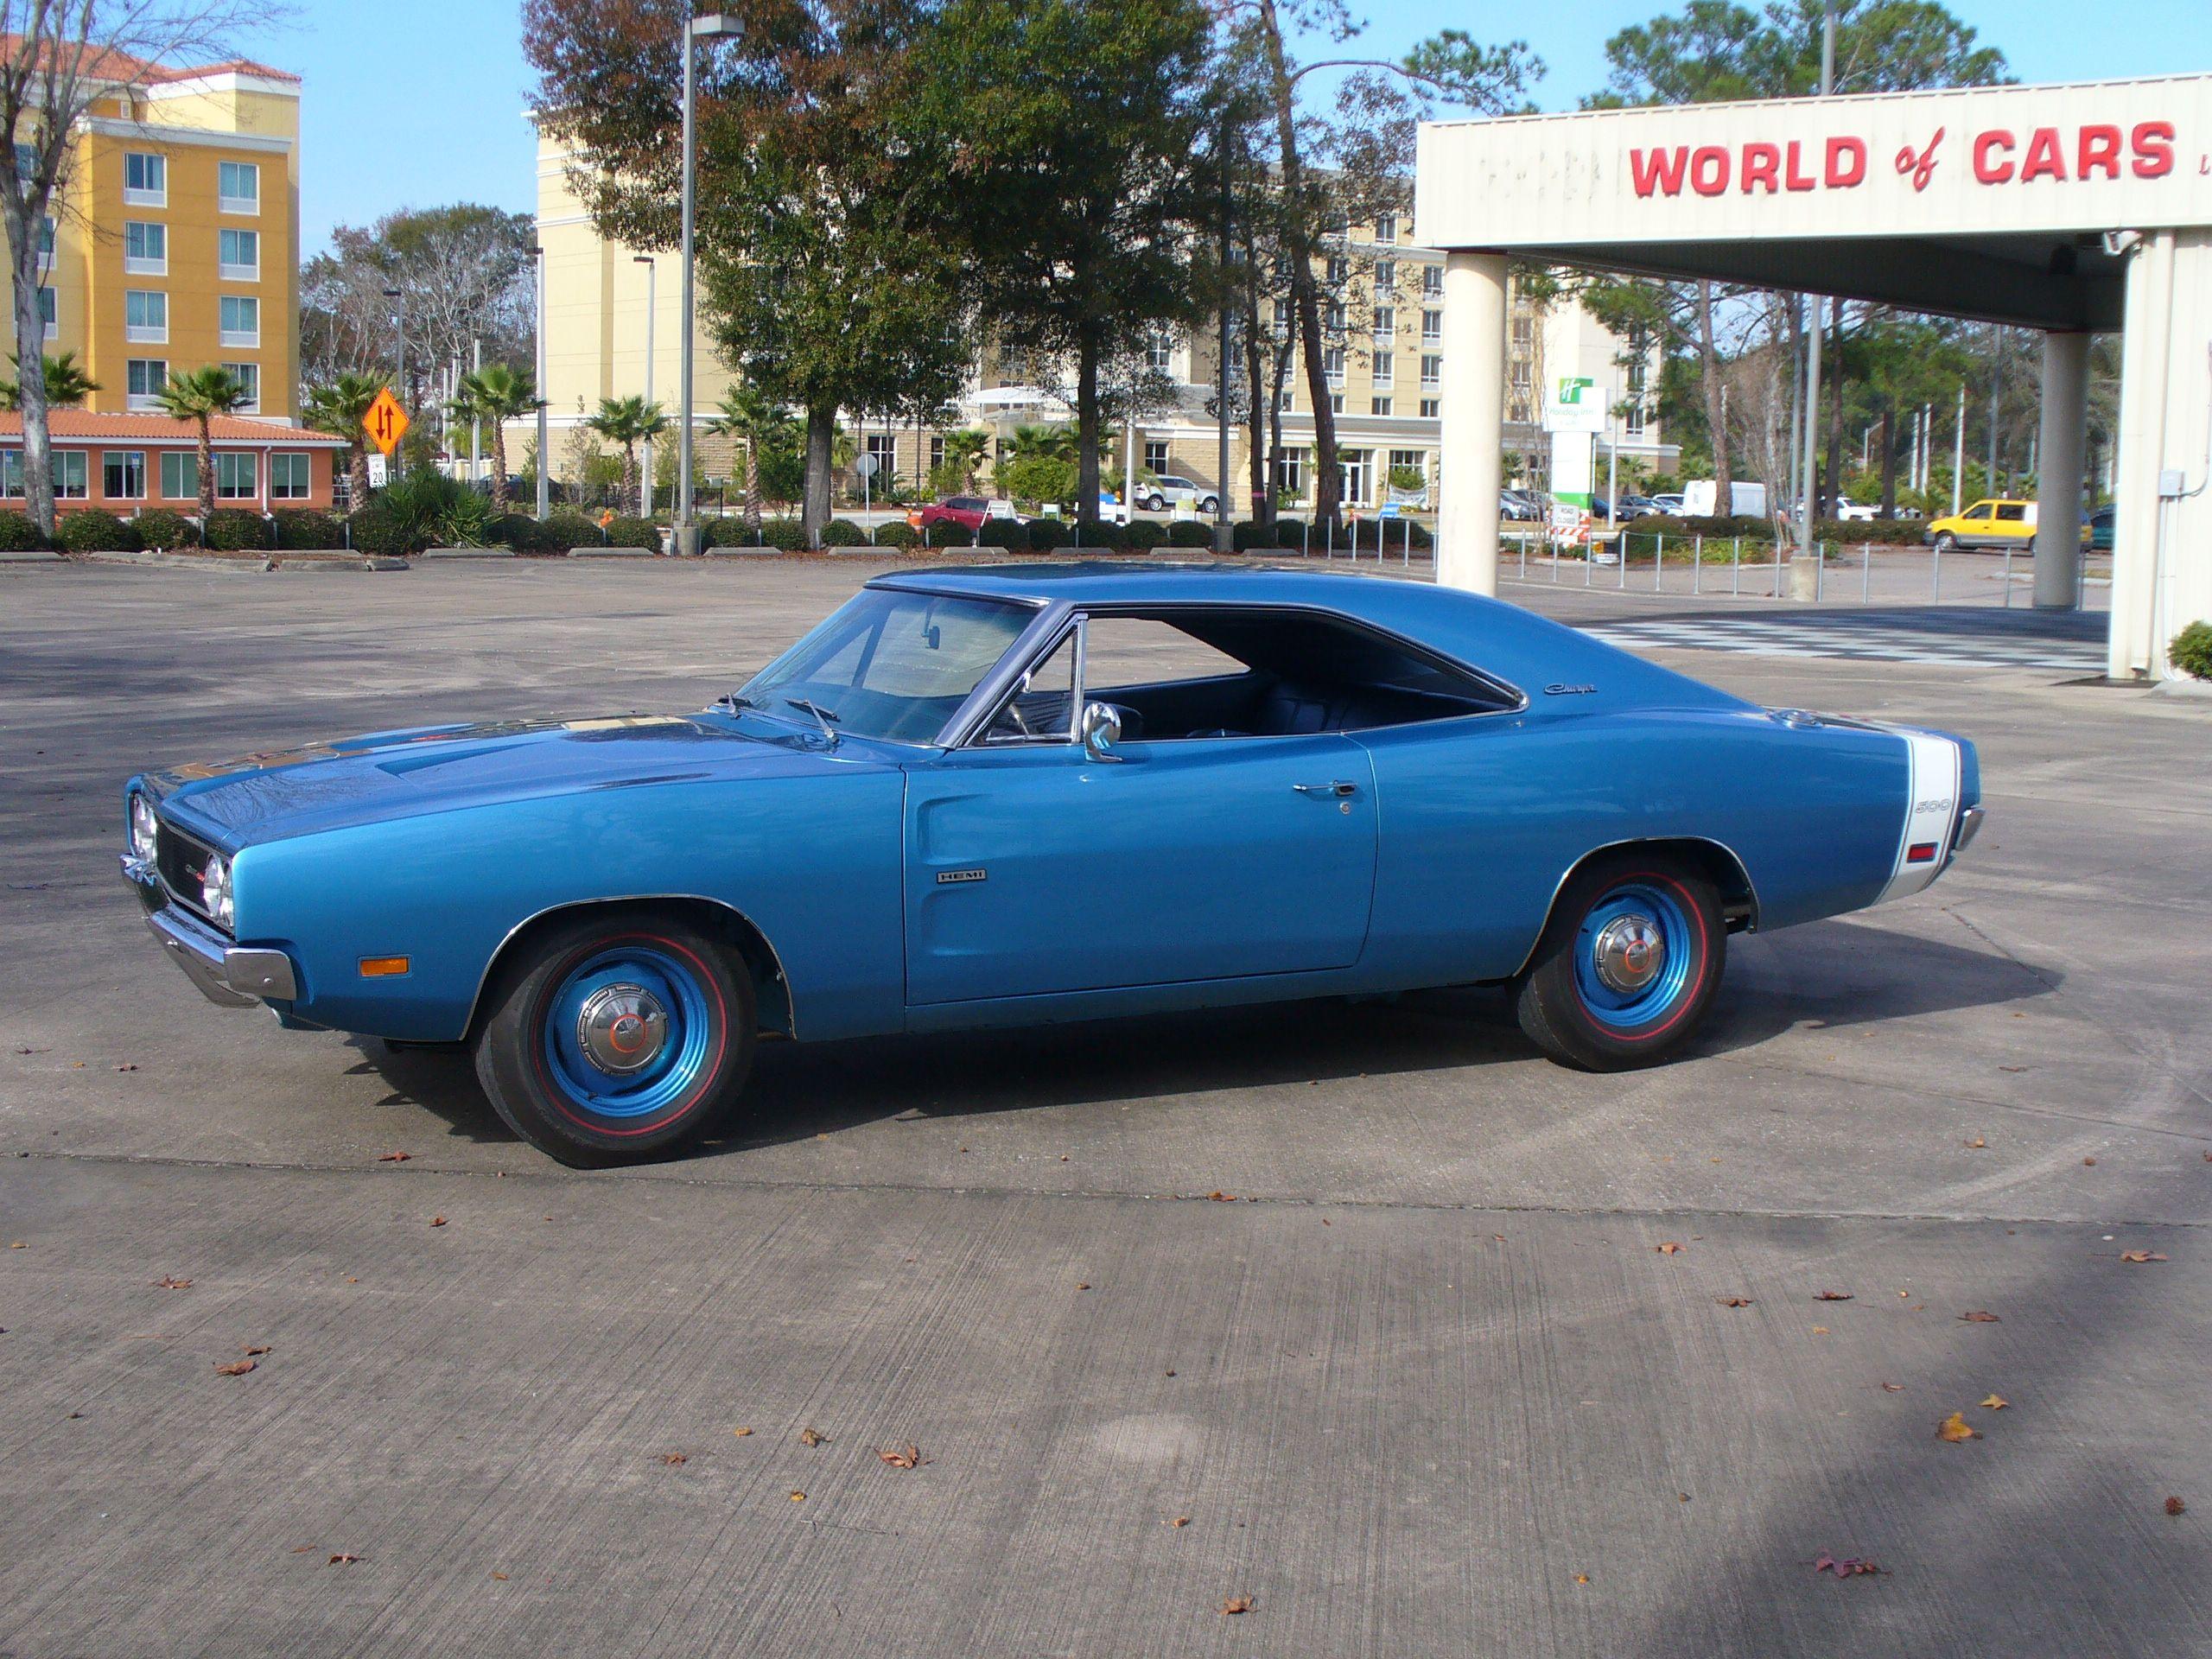 1969 Dodge Charger 500 Hemi Muscle Car Royalty Badass Cars